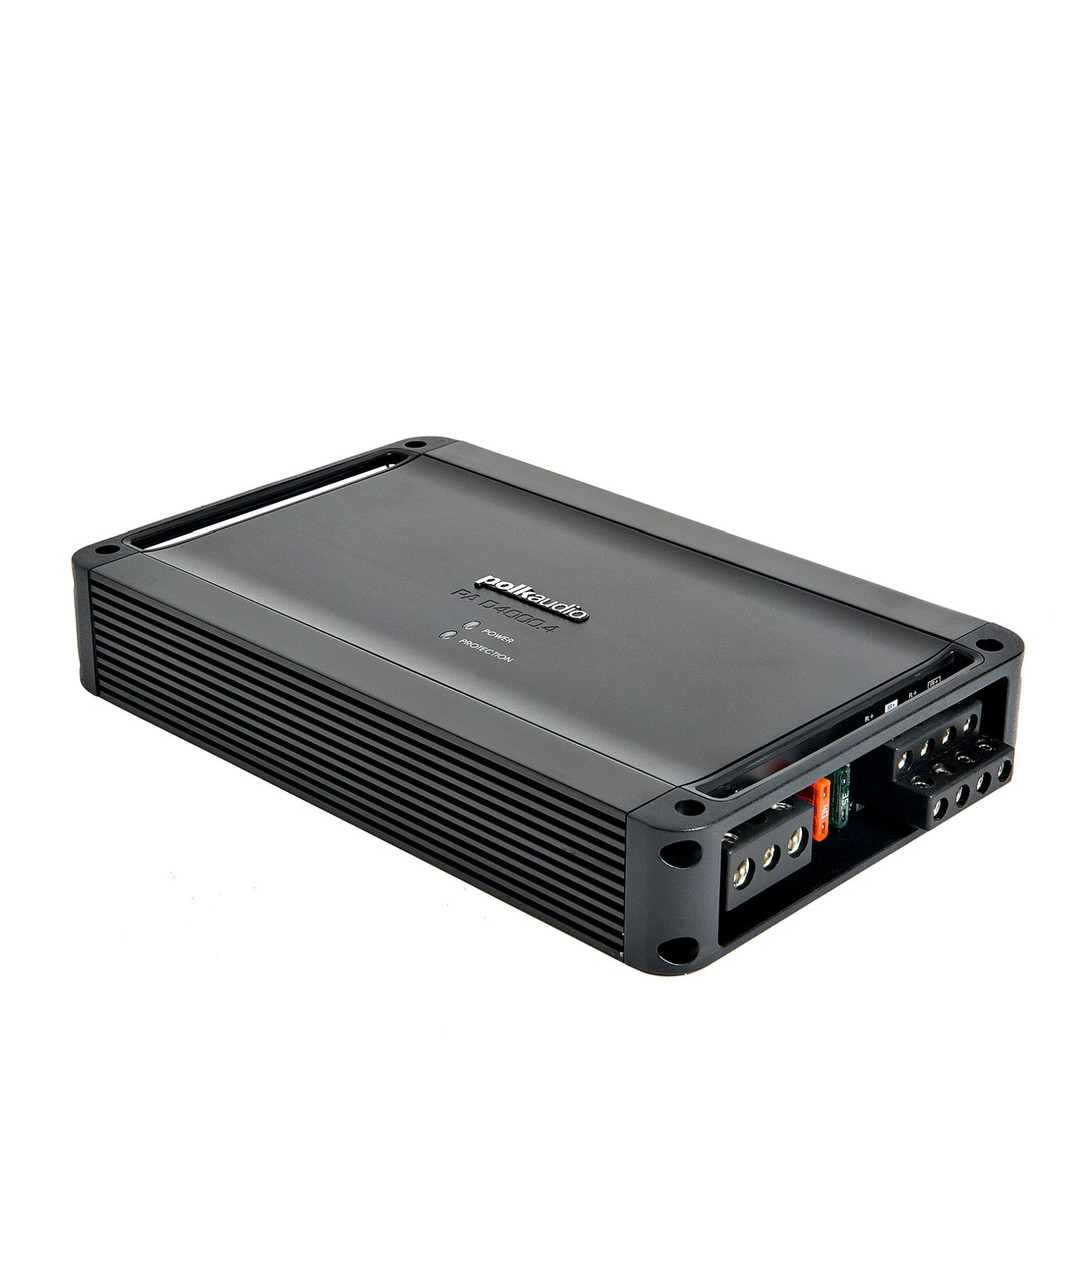 polk audio bundle a pair of db652 6 5 speakers a pair of db572 5x7 speakers pa d4000 4 amplifier wire kit creative audio [ 1280 x 1280 Pixel ]